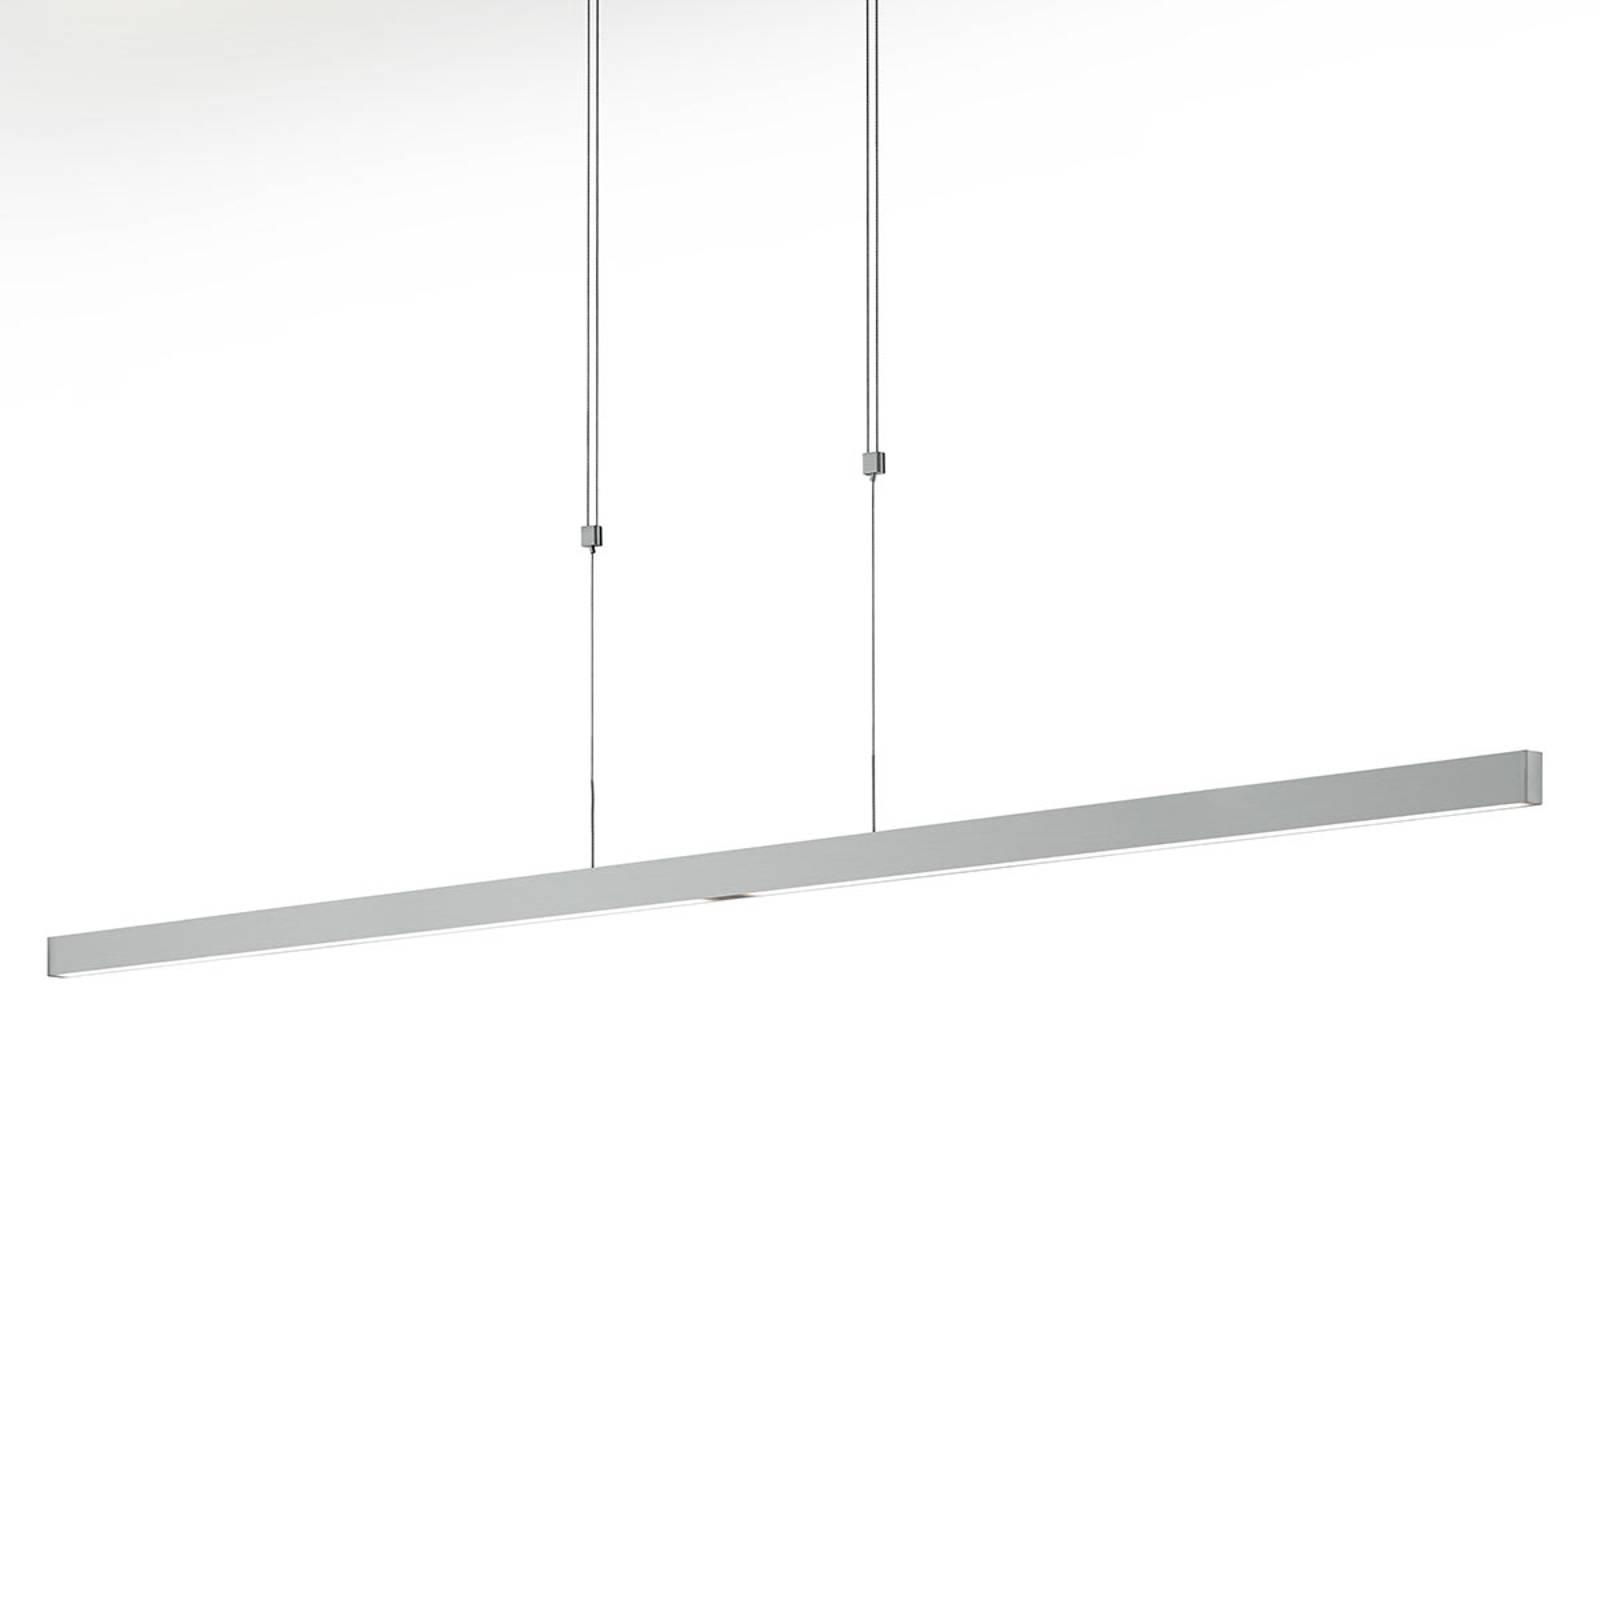 Met gebarensturing - LED hanglamp Romi